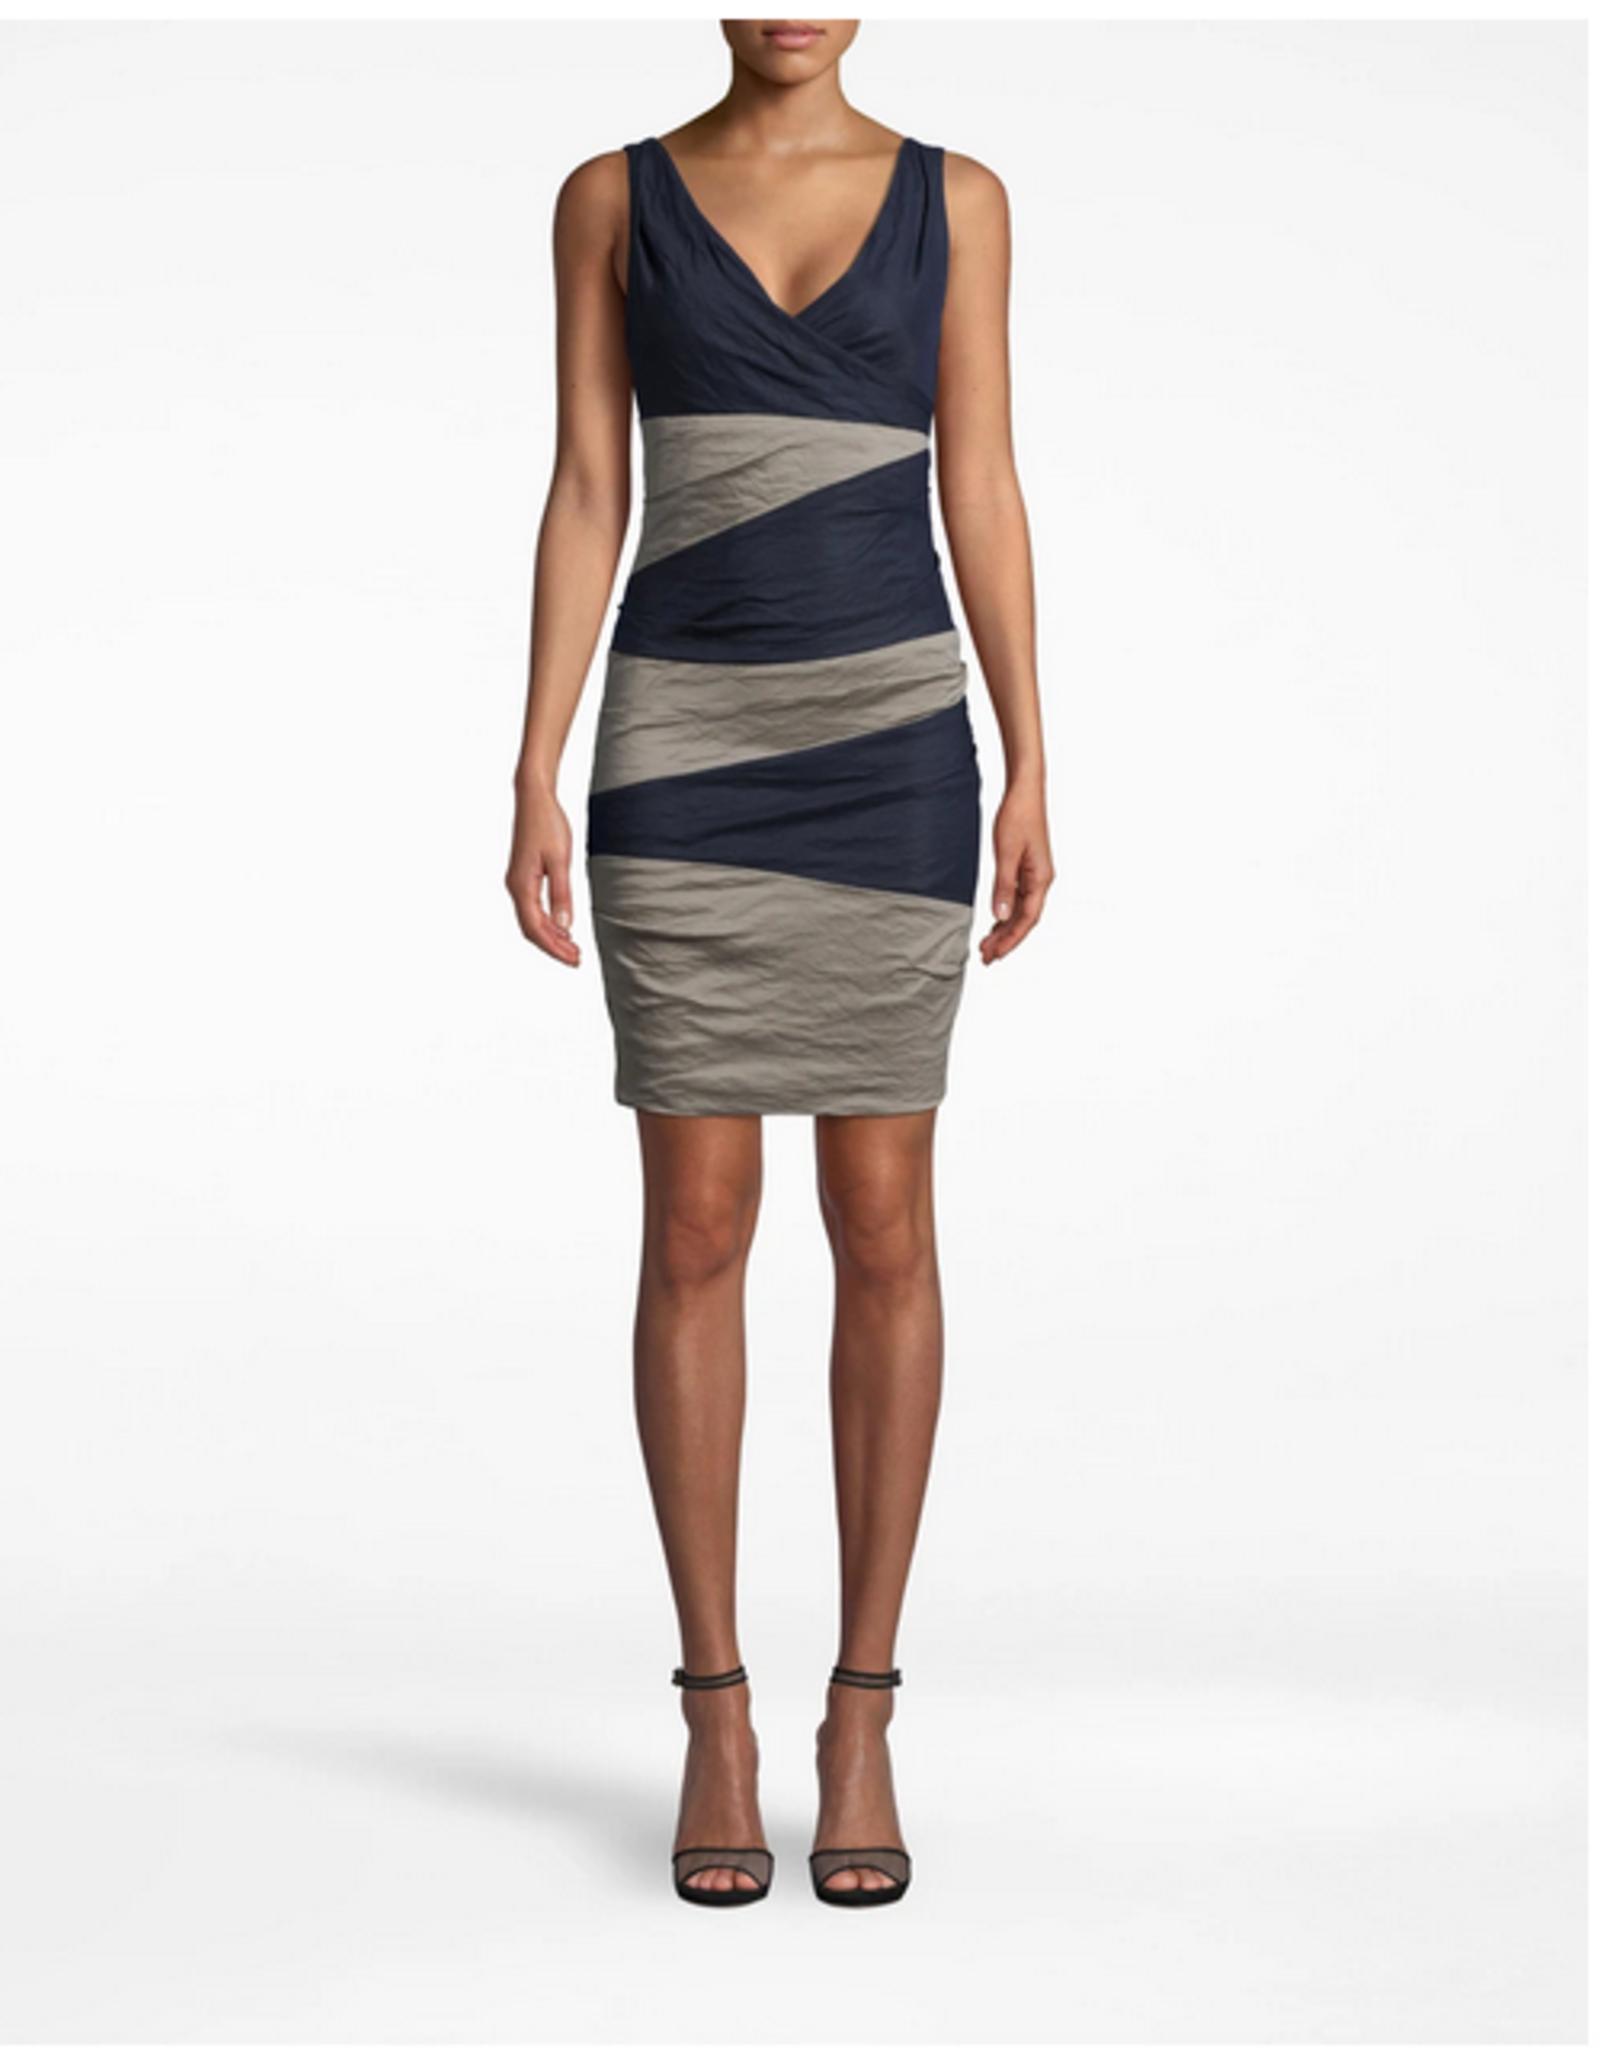 Flagger dress